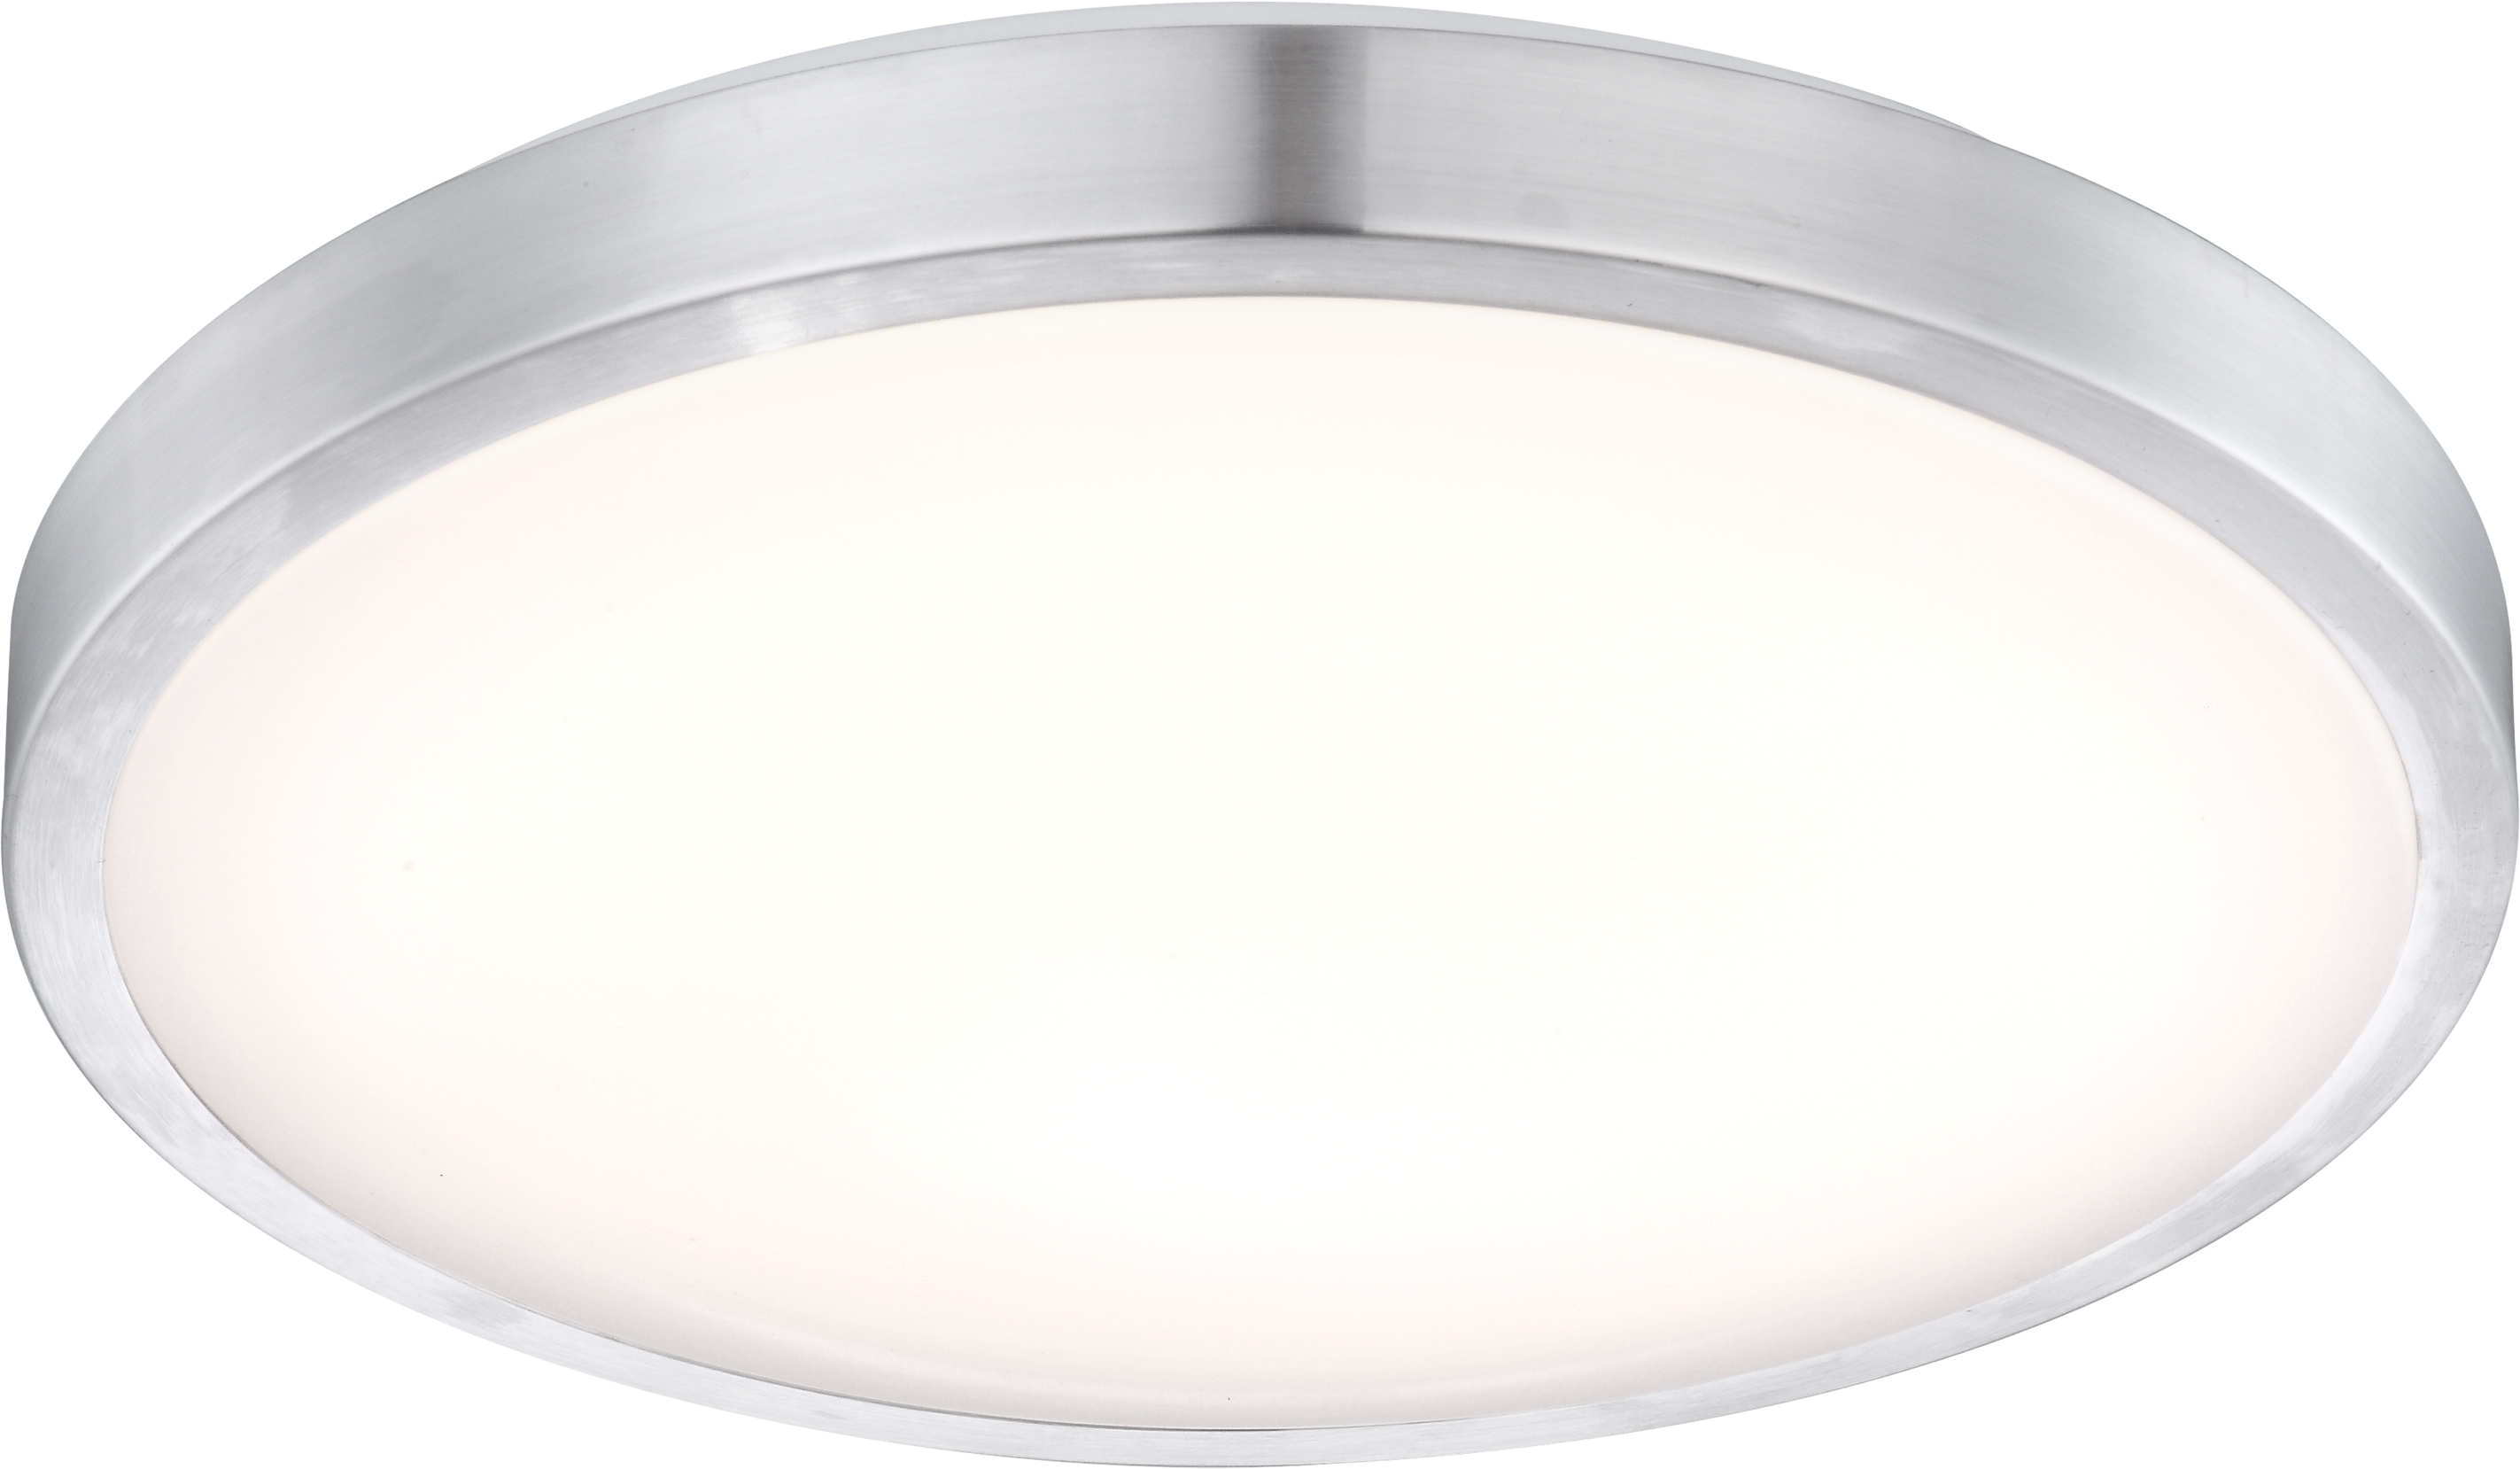 robyn badezimmer r ume produkte globo lighting leuchten lampen online kaufen. Black Bedroom Furniture Sets. Home Design Ideas